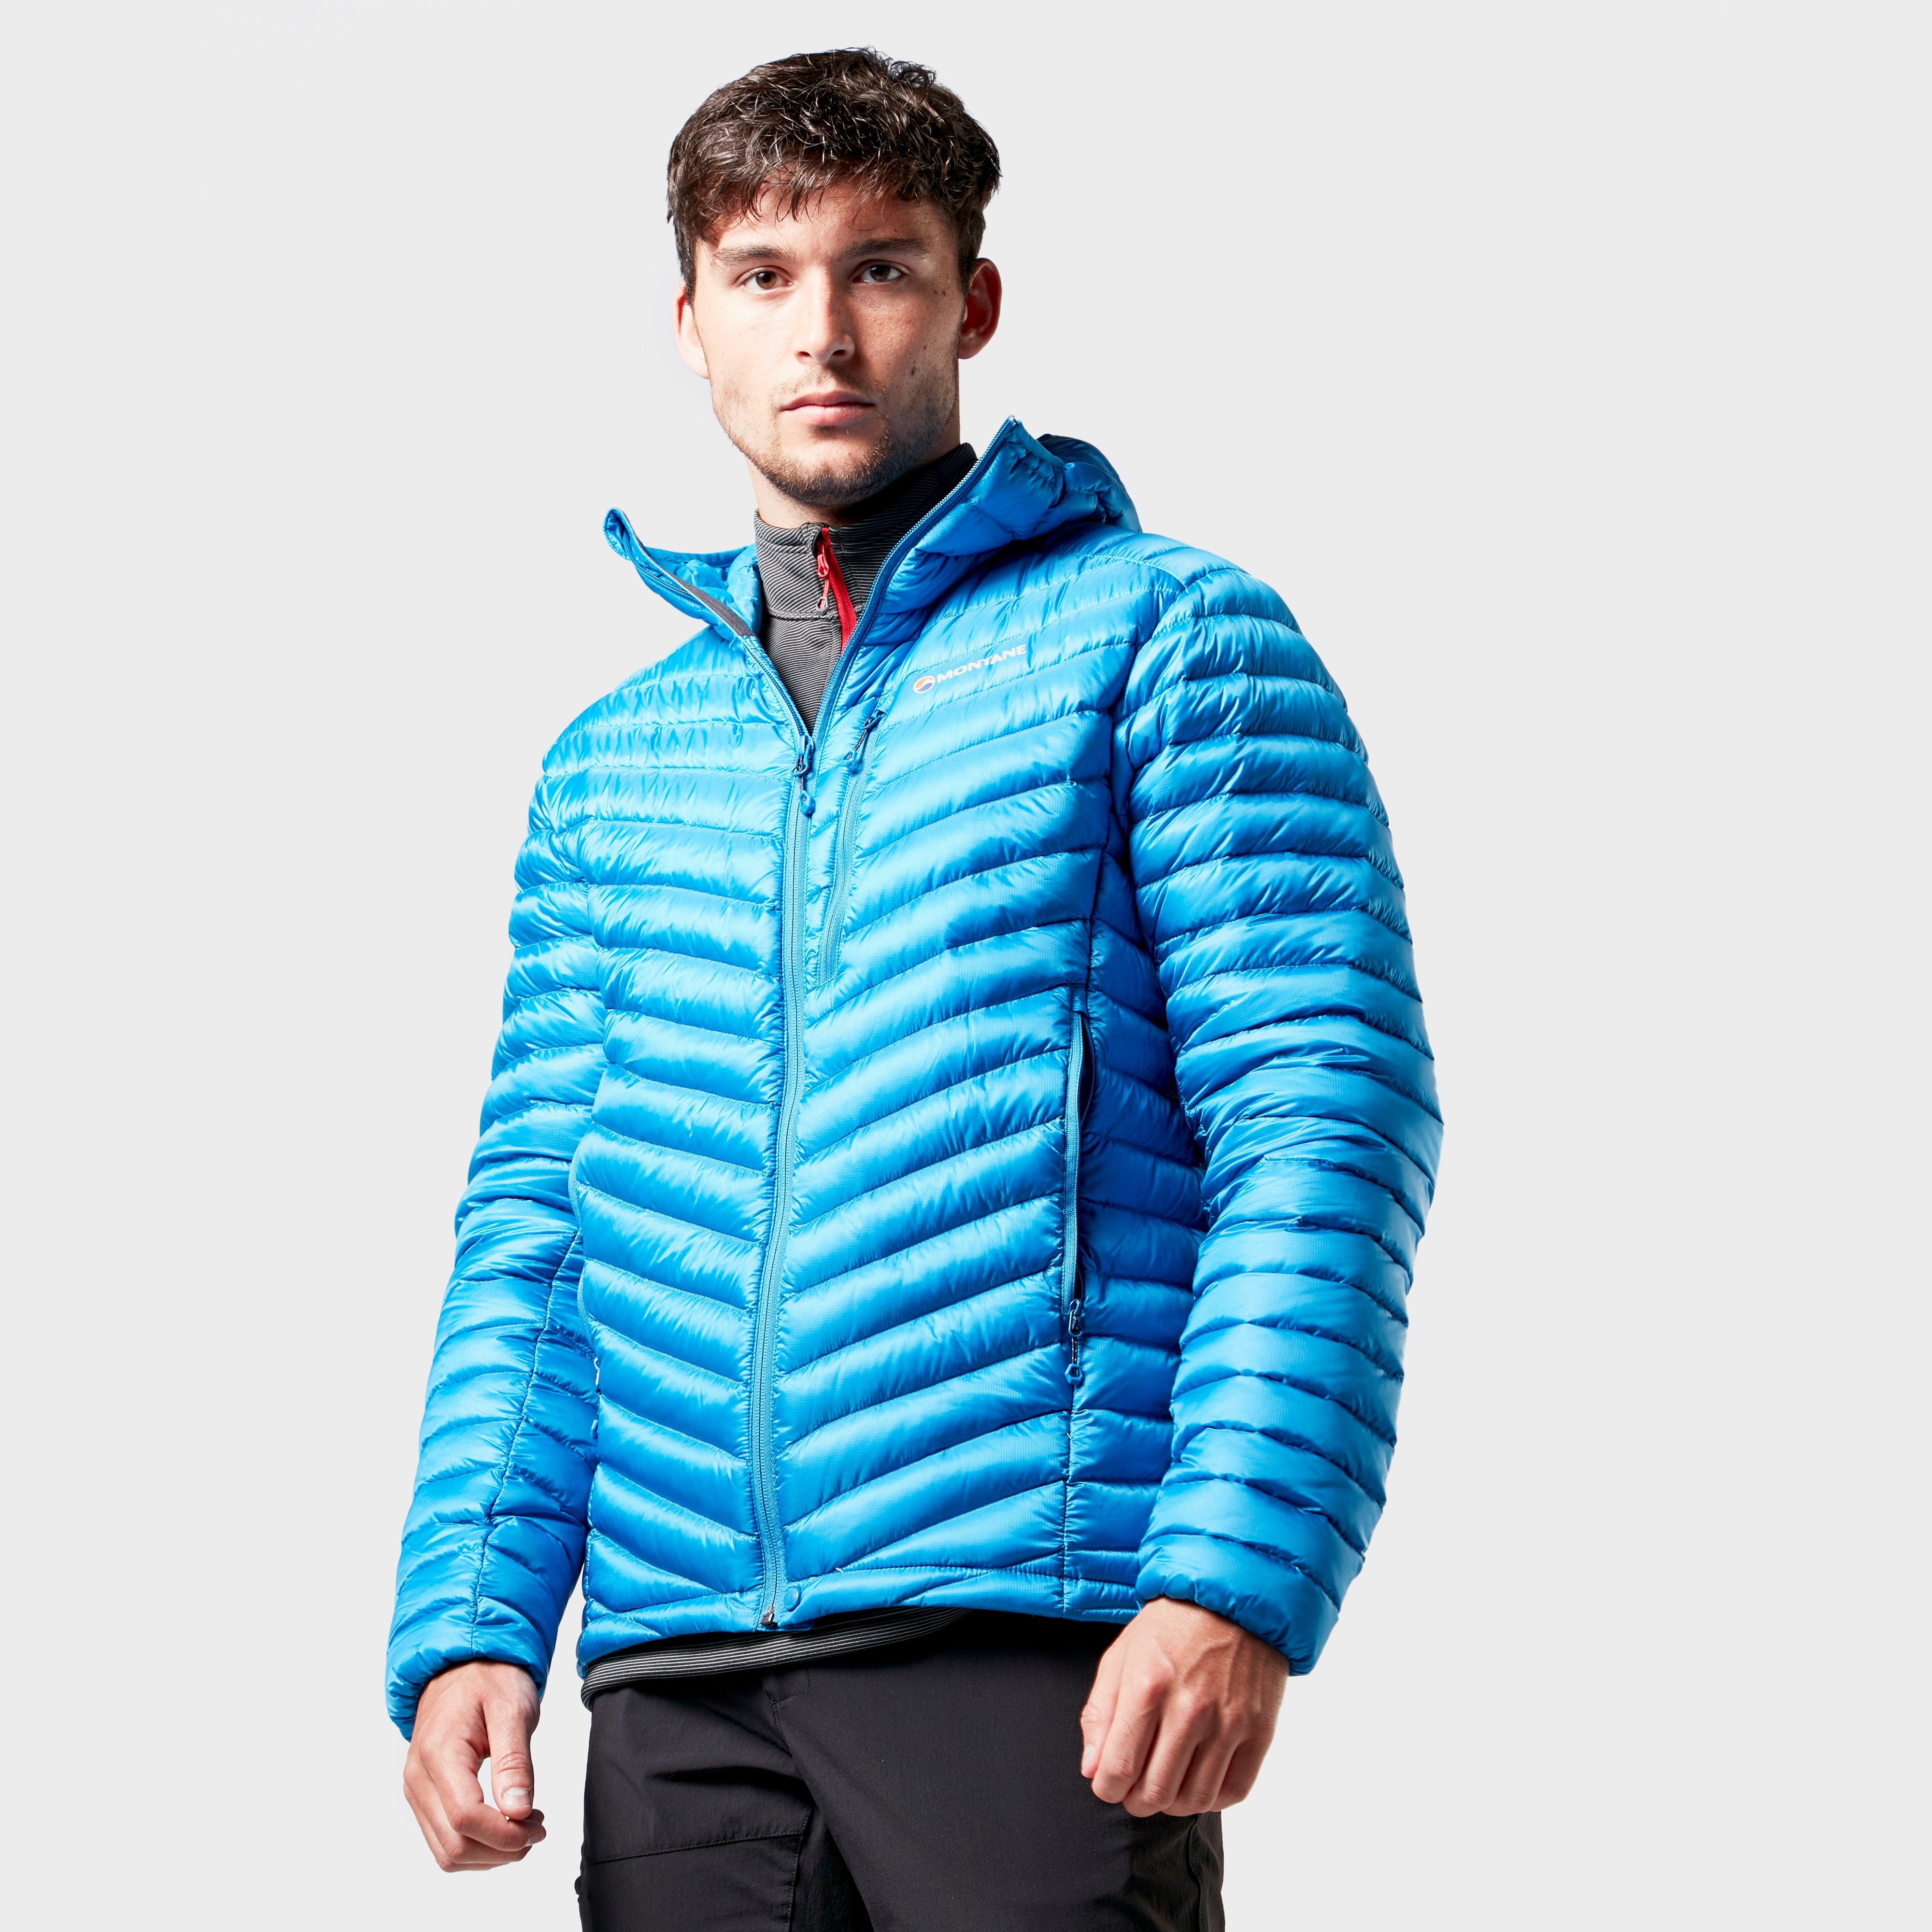 Montane Montane Mens Turbio Down Jacket - Blue, Blue